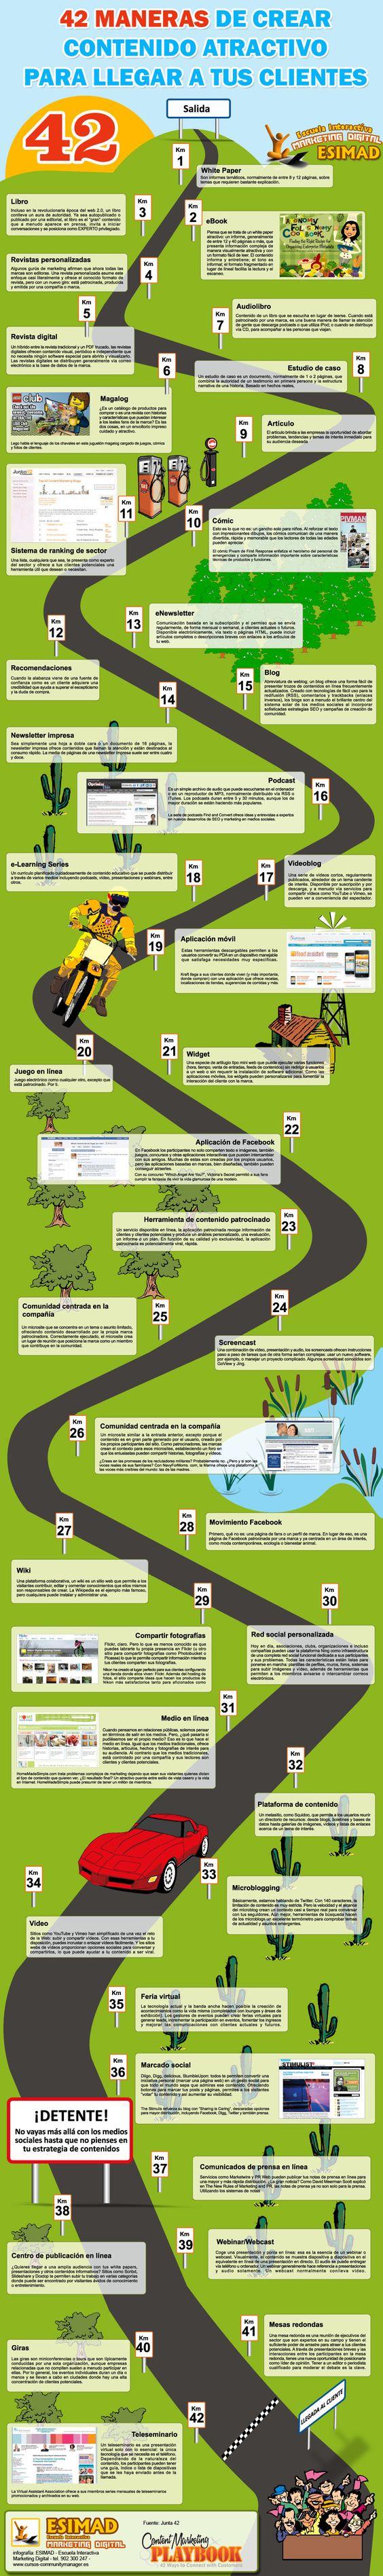 42 tipos de contenido para no cansar al lector de tu blog #infografia #communityManager